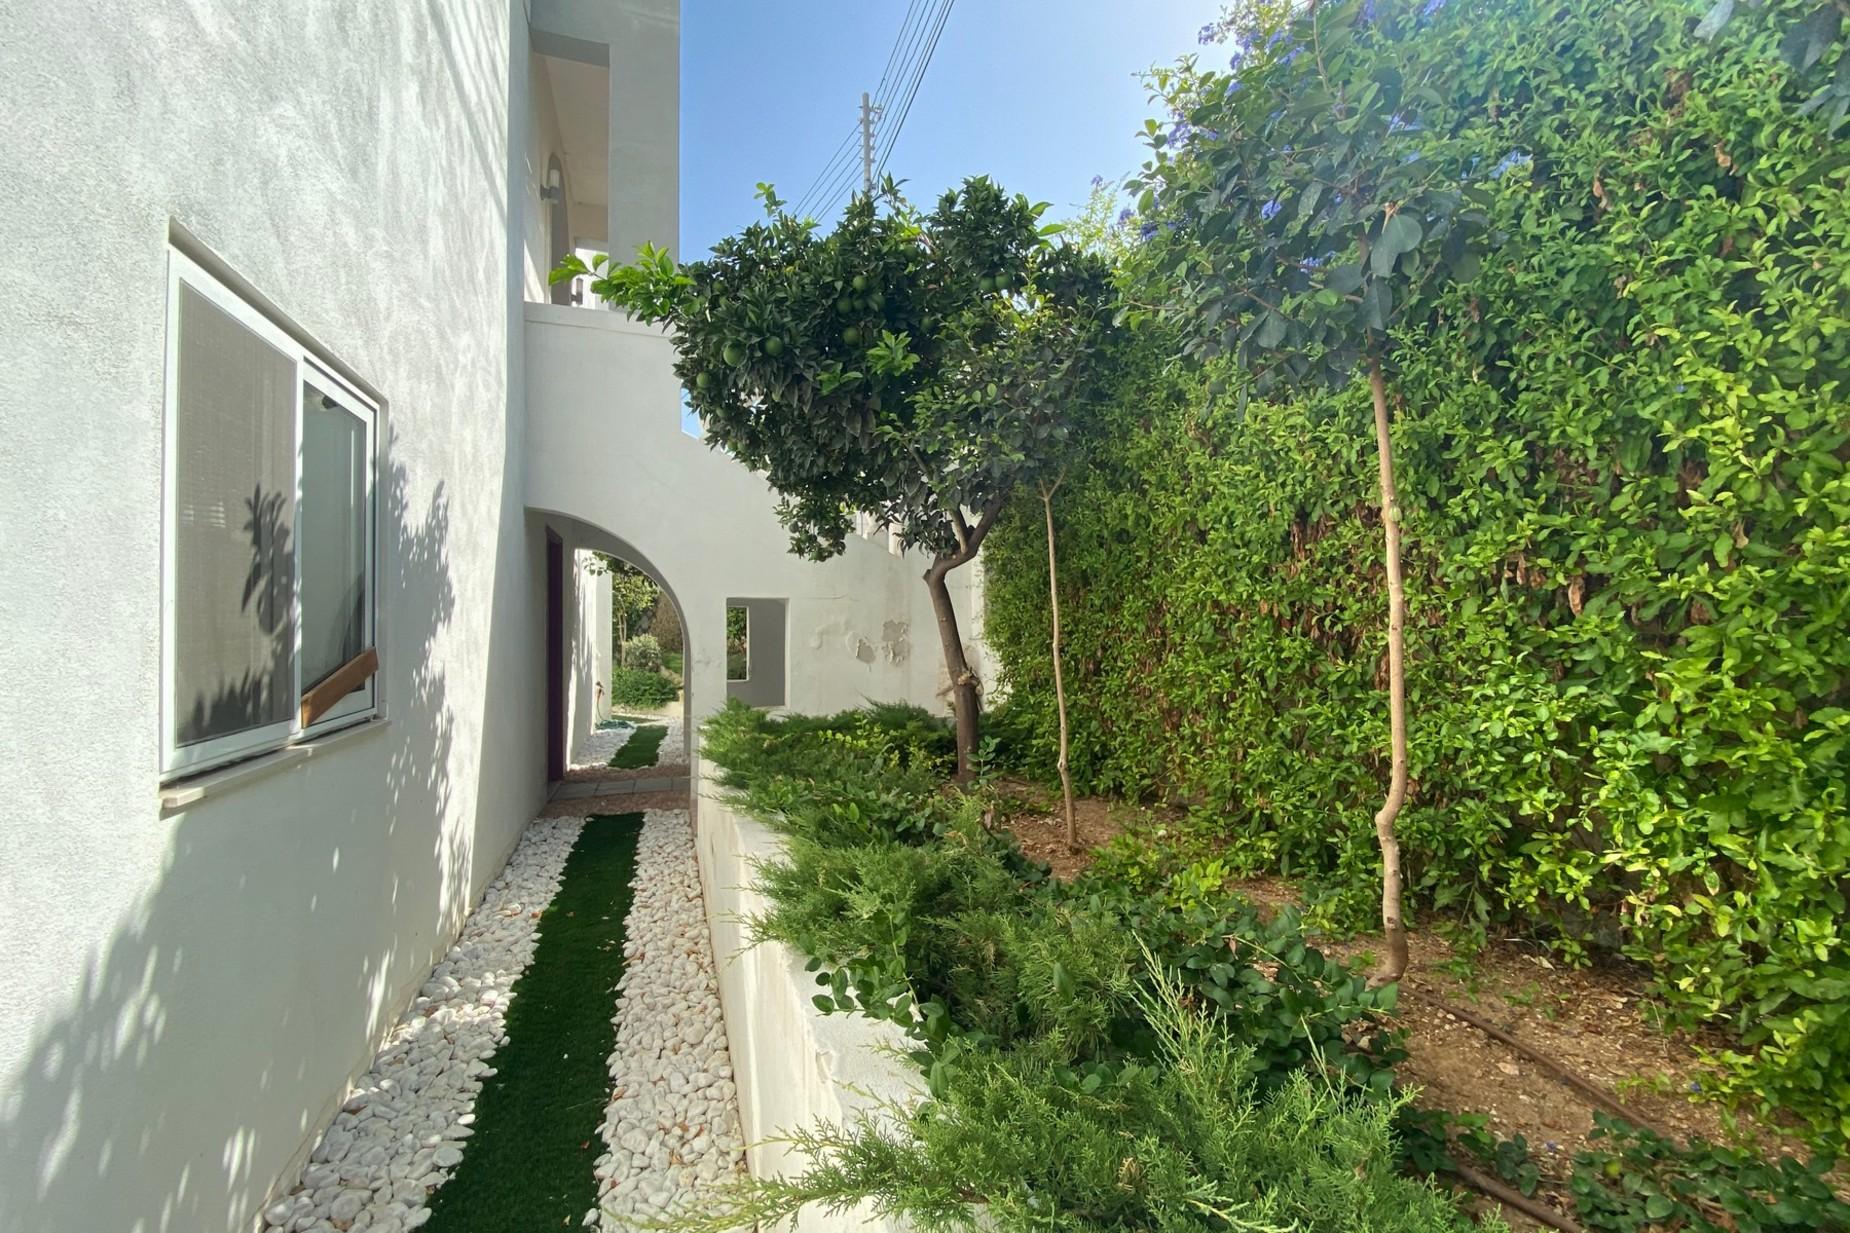 3 bed Villa For Sale in Santa Venera, Santa Venera - thumb 2